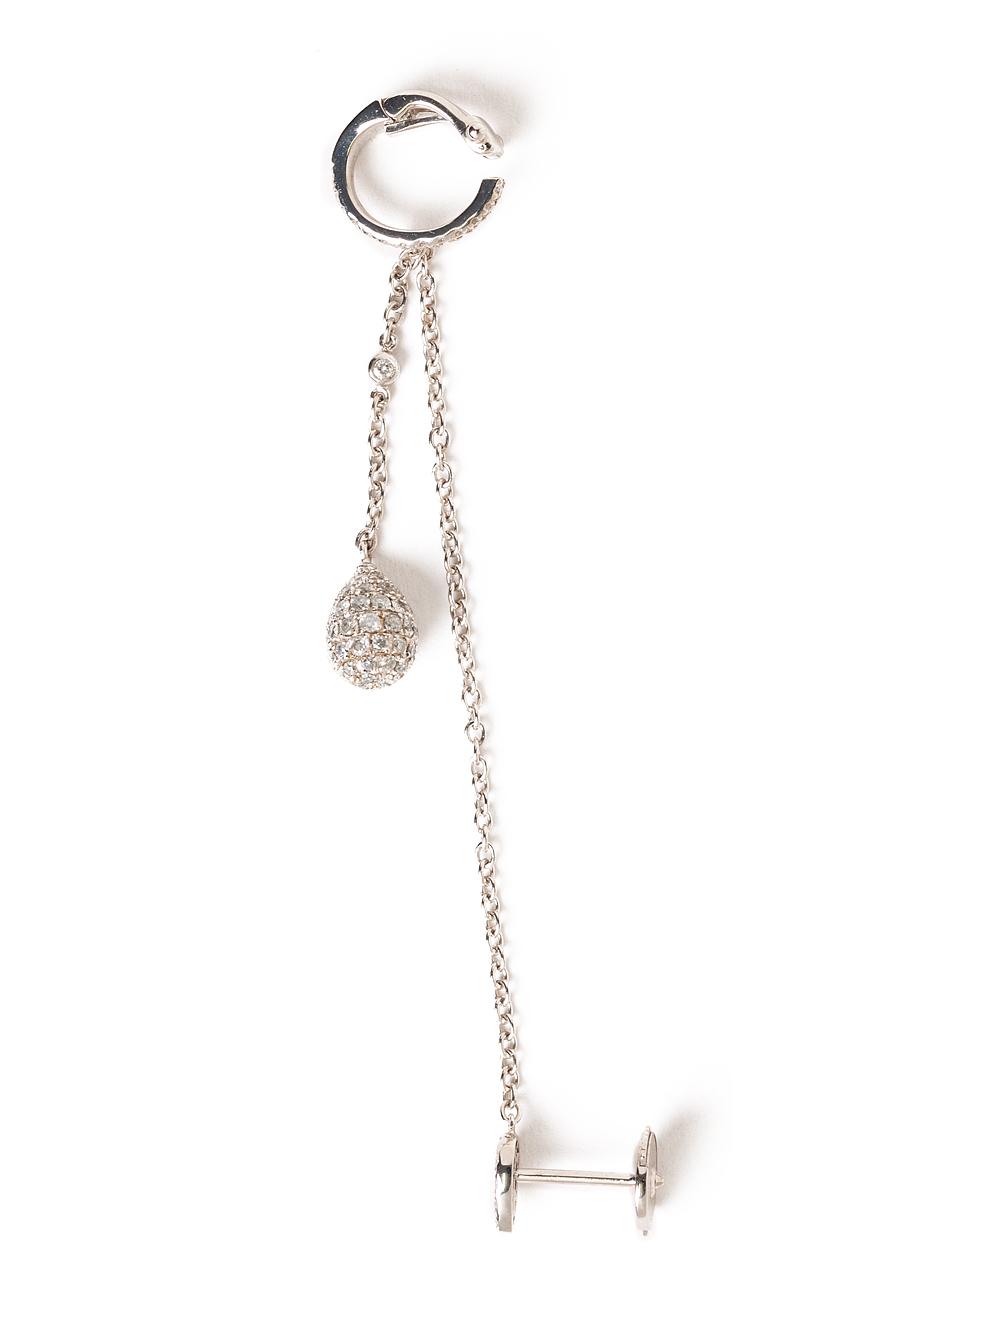 Elise dray Cartilage Earring in Metallic